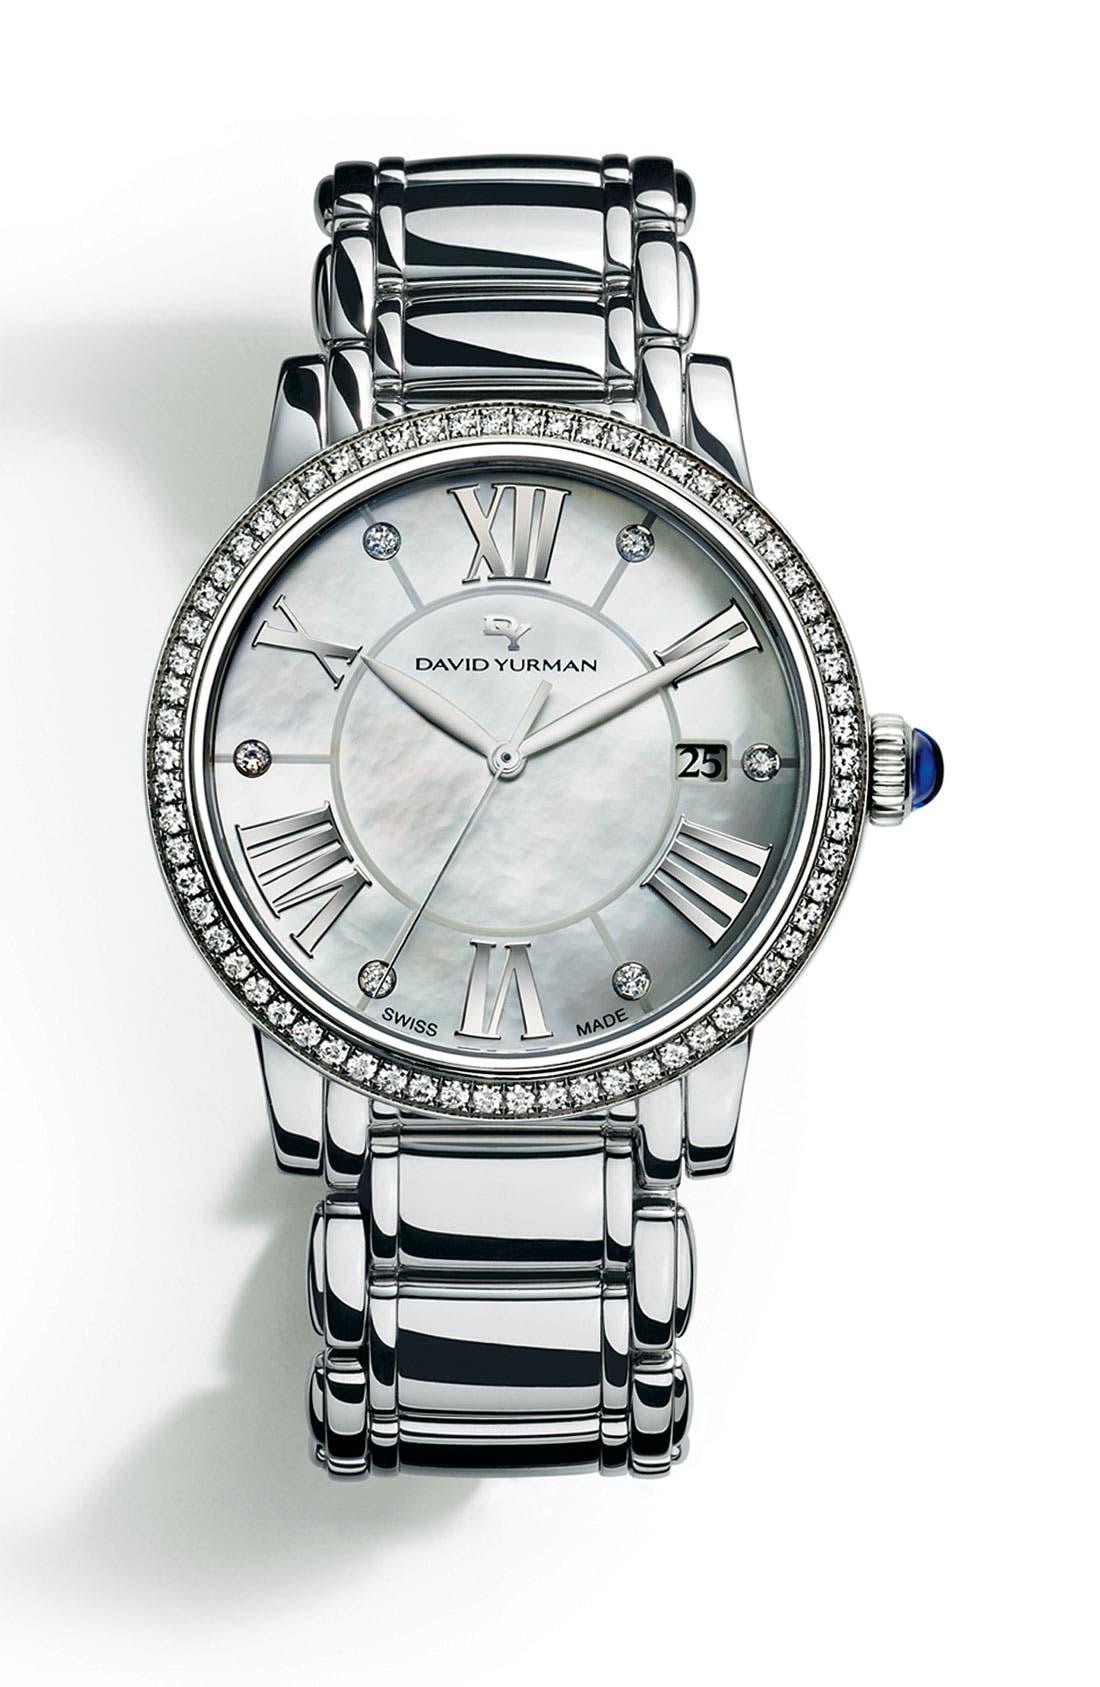 David Yurman 'Classic' 38mm Quartz Watch